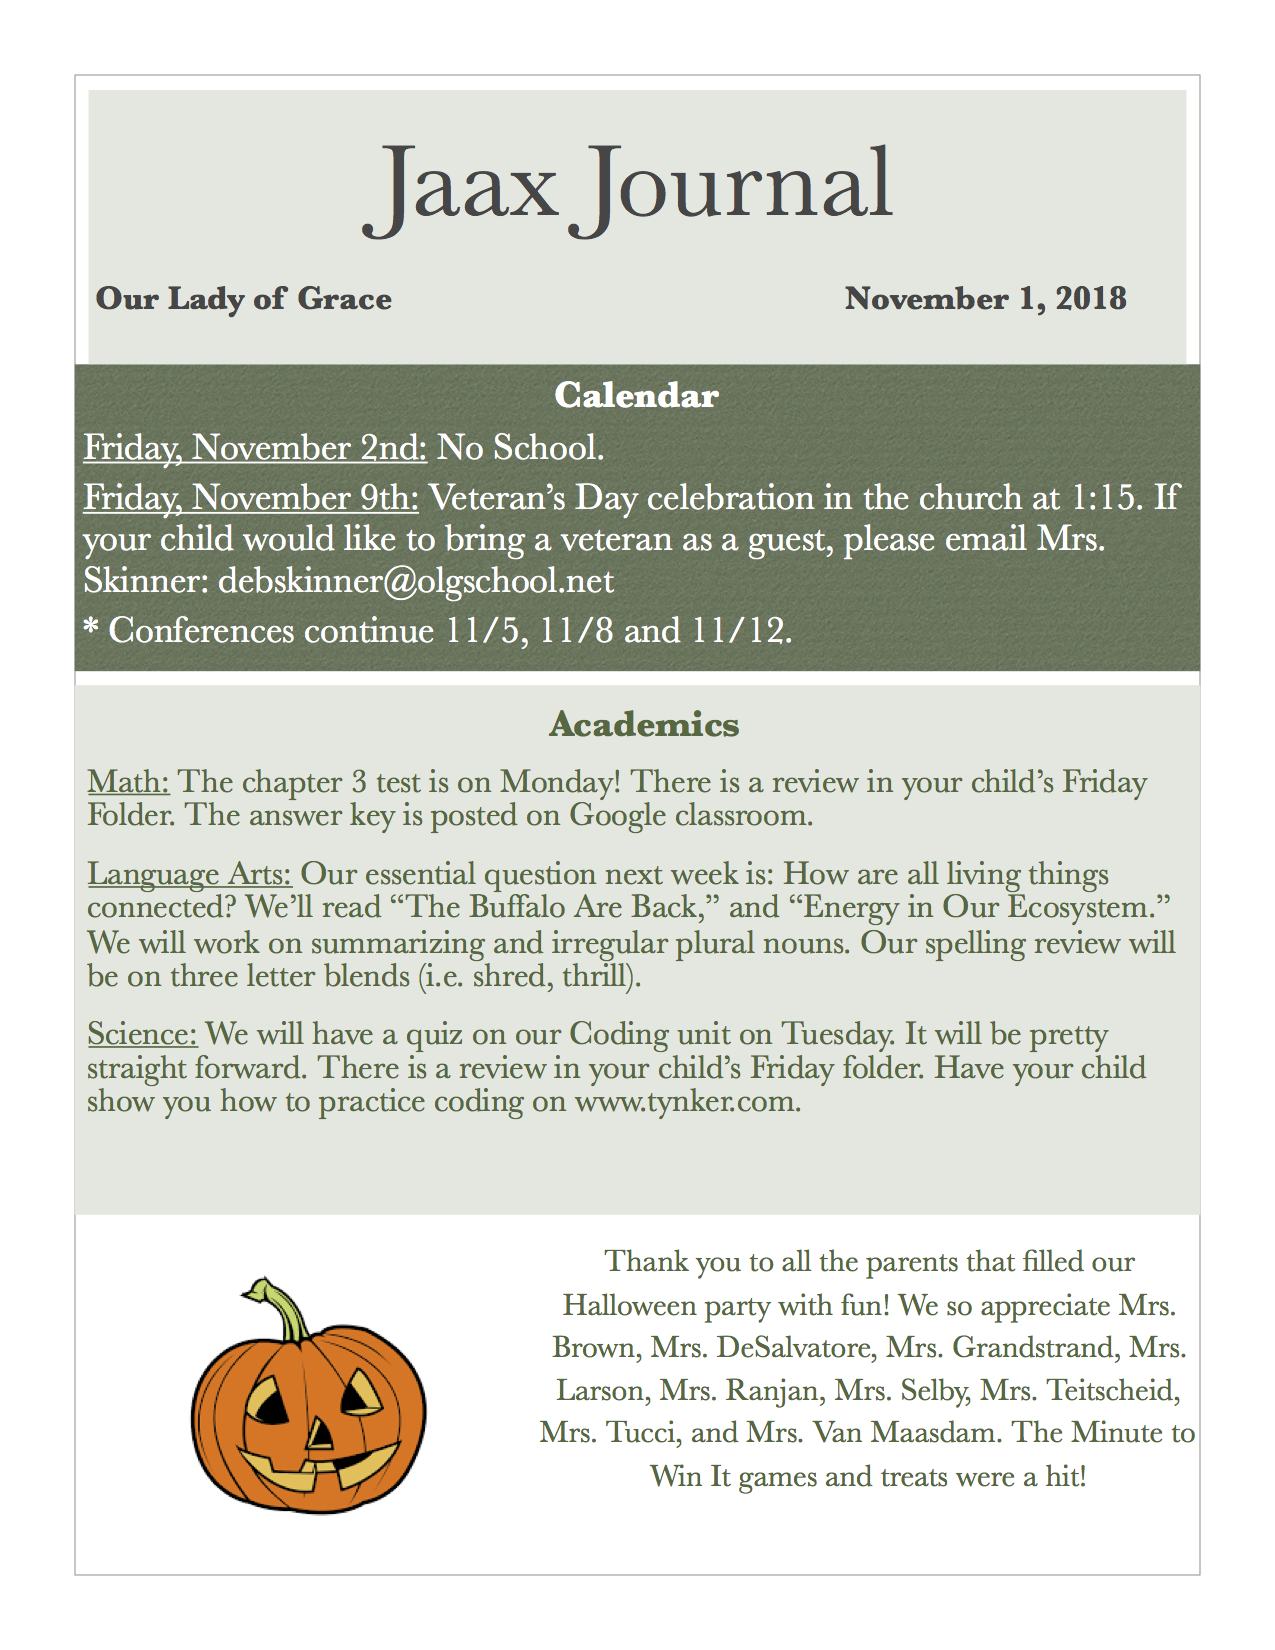 JaaxJournal11-1-18.jpg